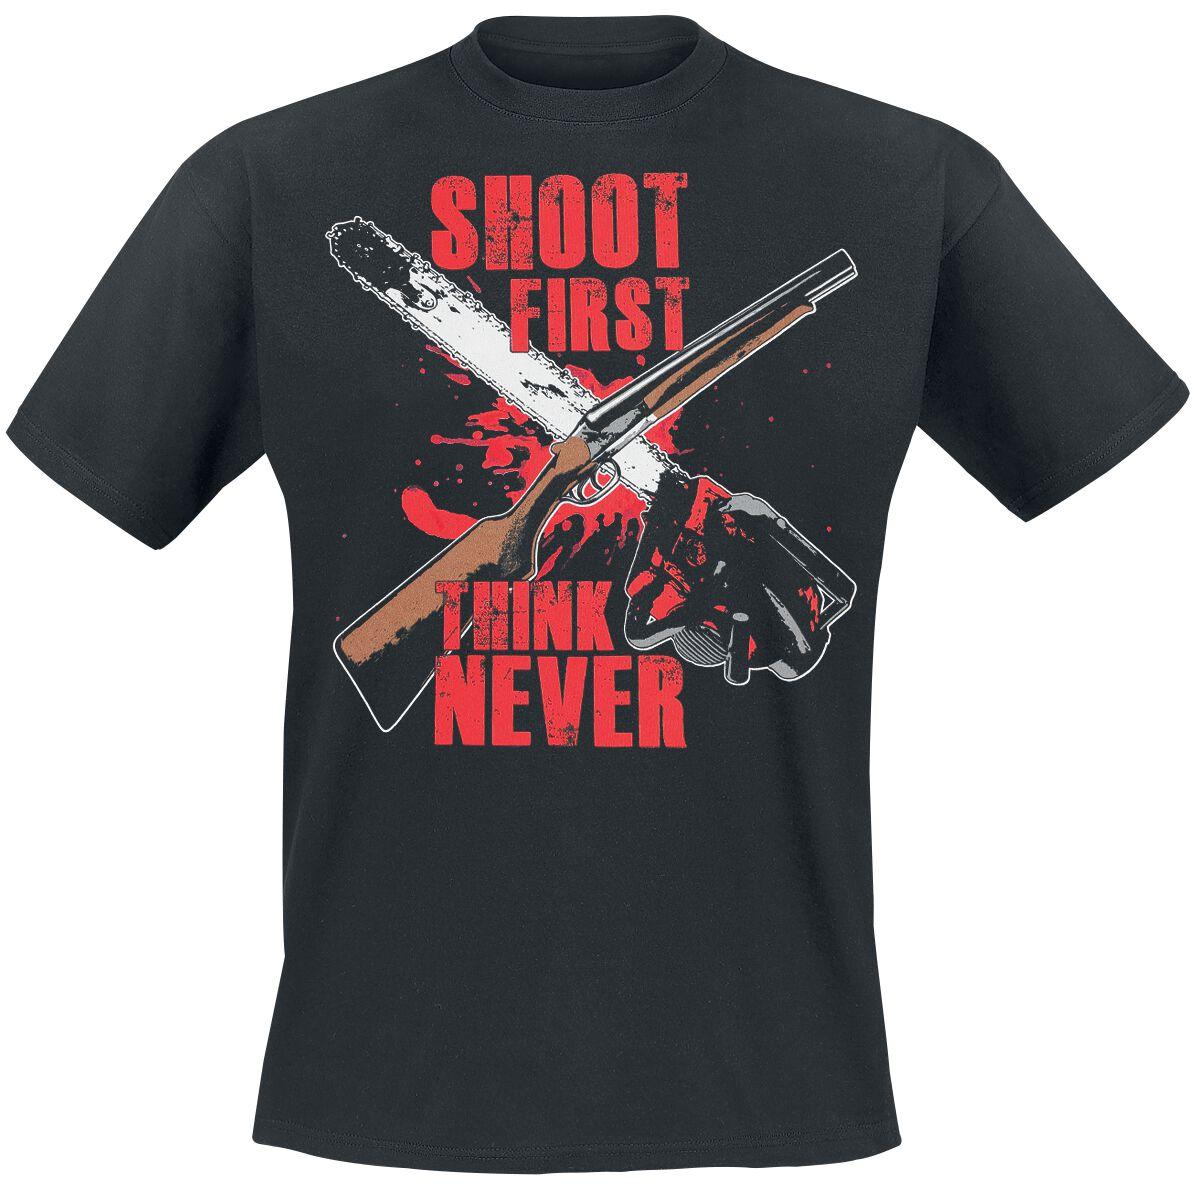 Merch dla Fanów - Koszulki - T-Shirt Ash vs. Evil Dead Shoot First T-Shirt czarny - 367370